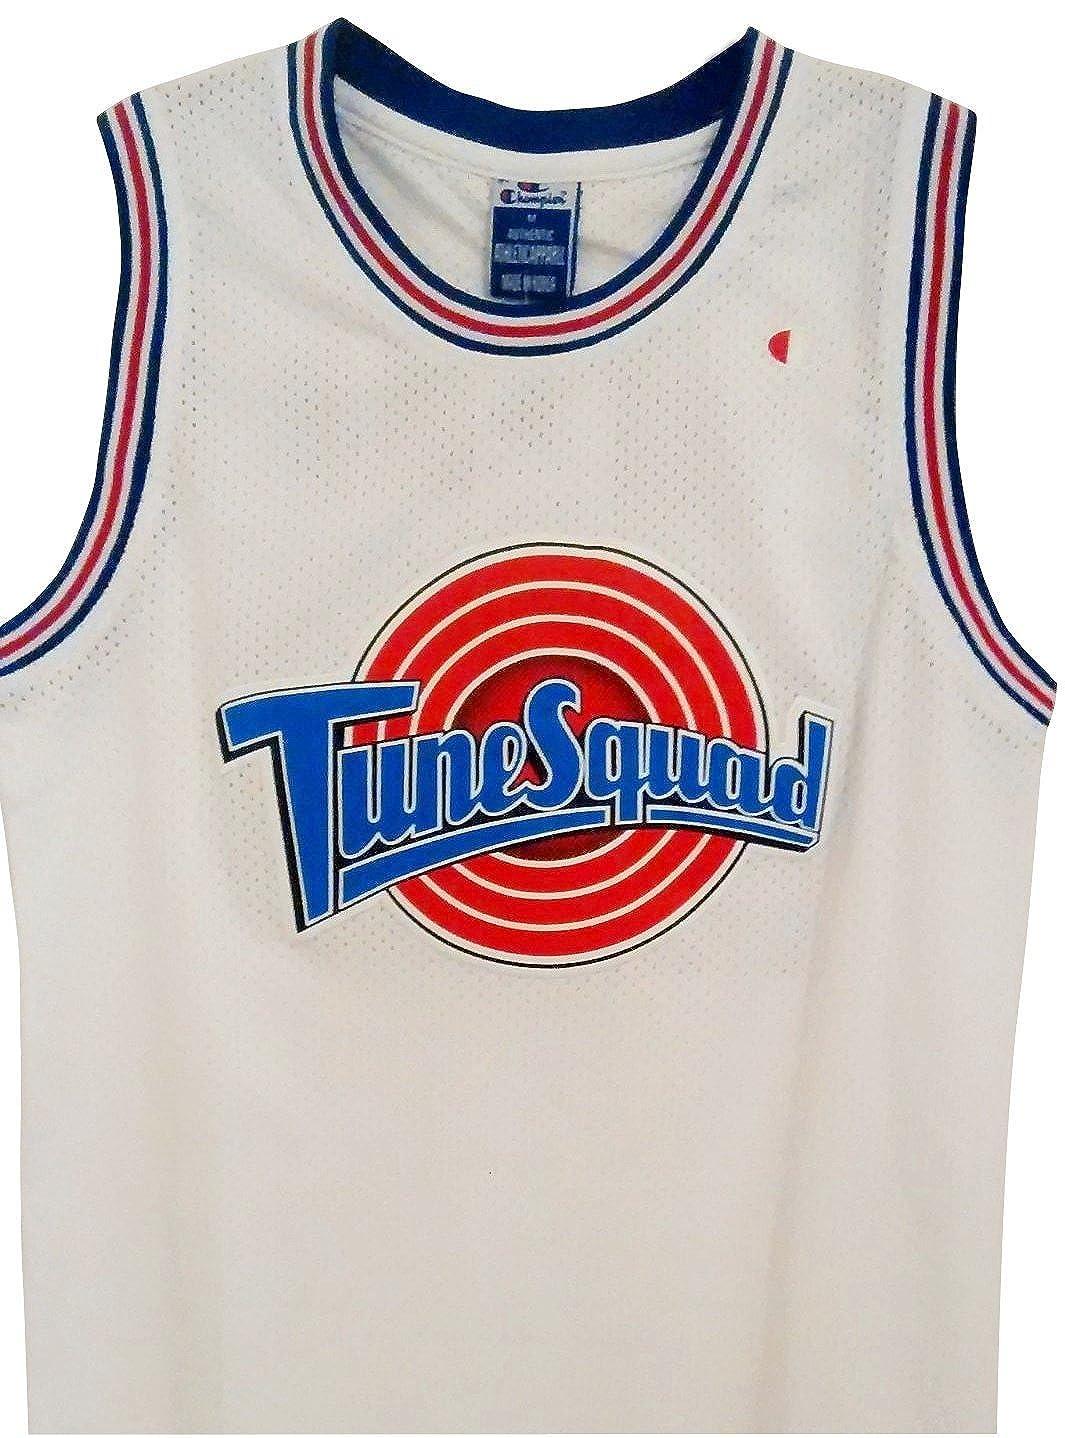 in stock 2678b e5954 Hqc5mi45gc Sports #23 Men's Jordan Tune Squad Space Jam Classics White  Basketball Jersey